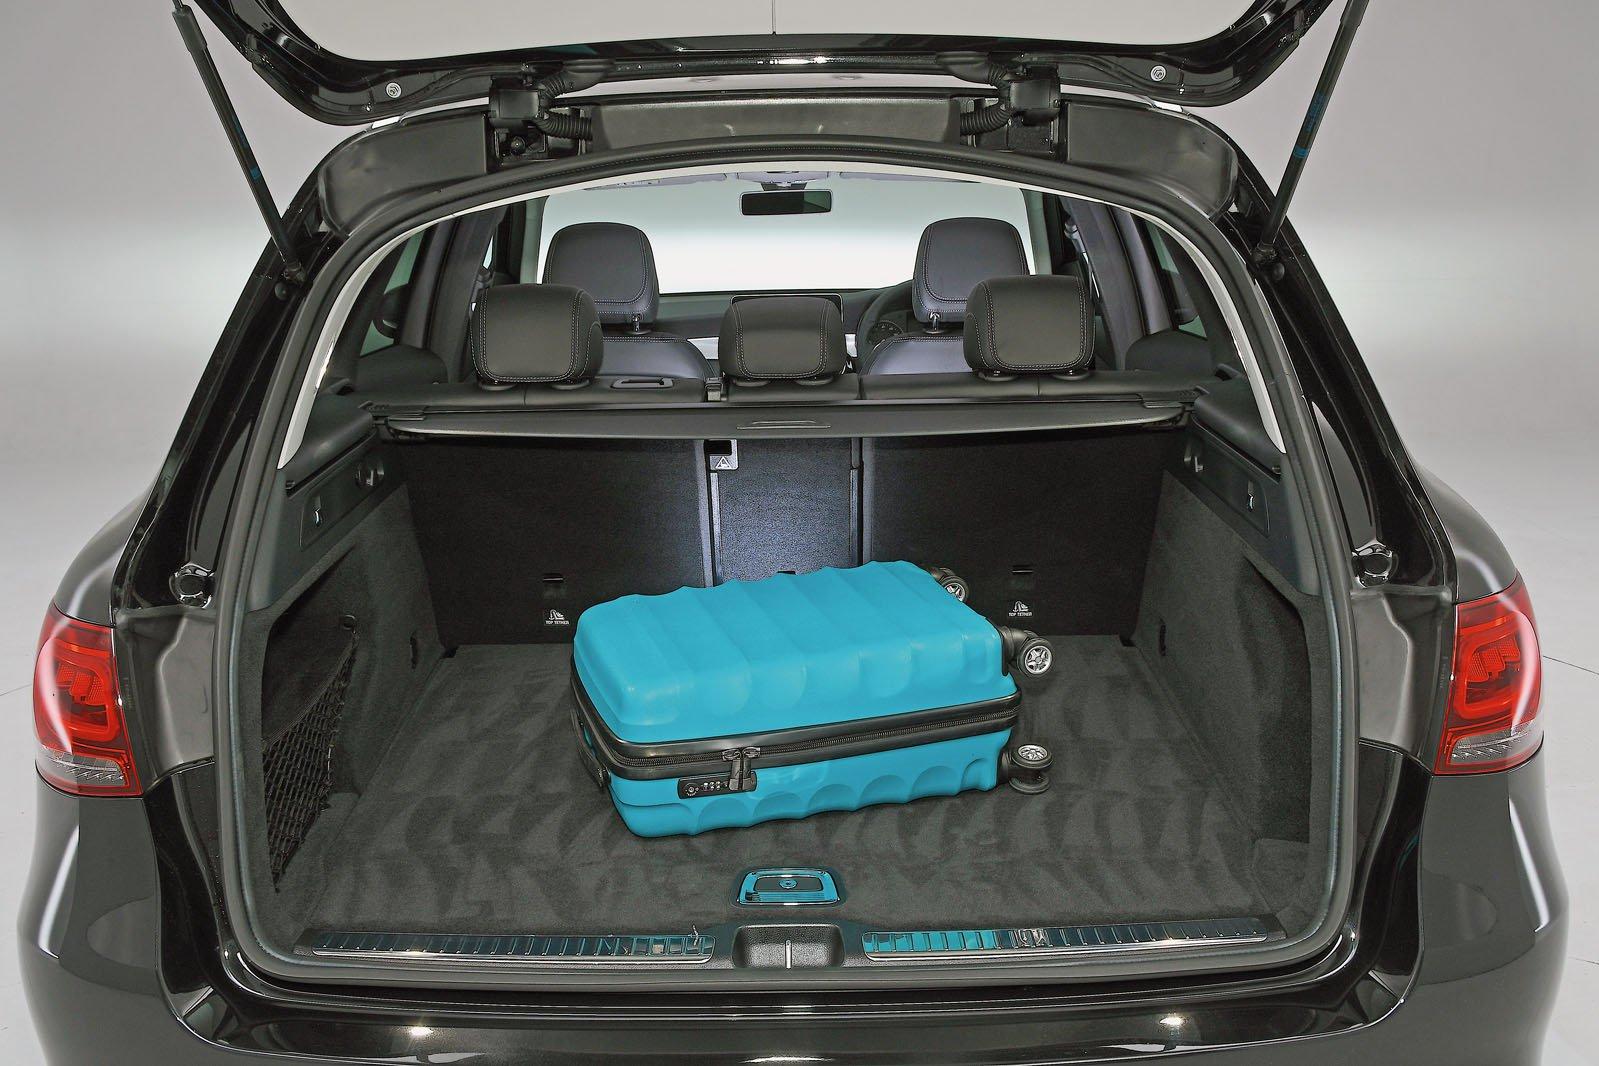 Mercedes GLC boot